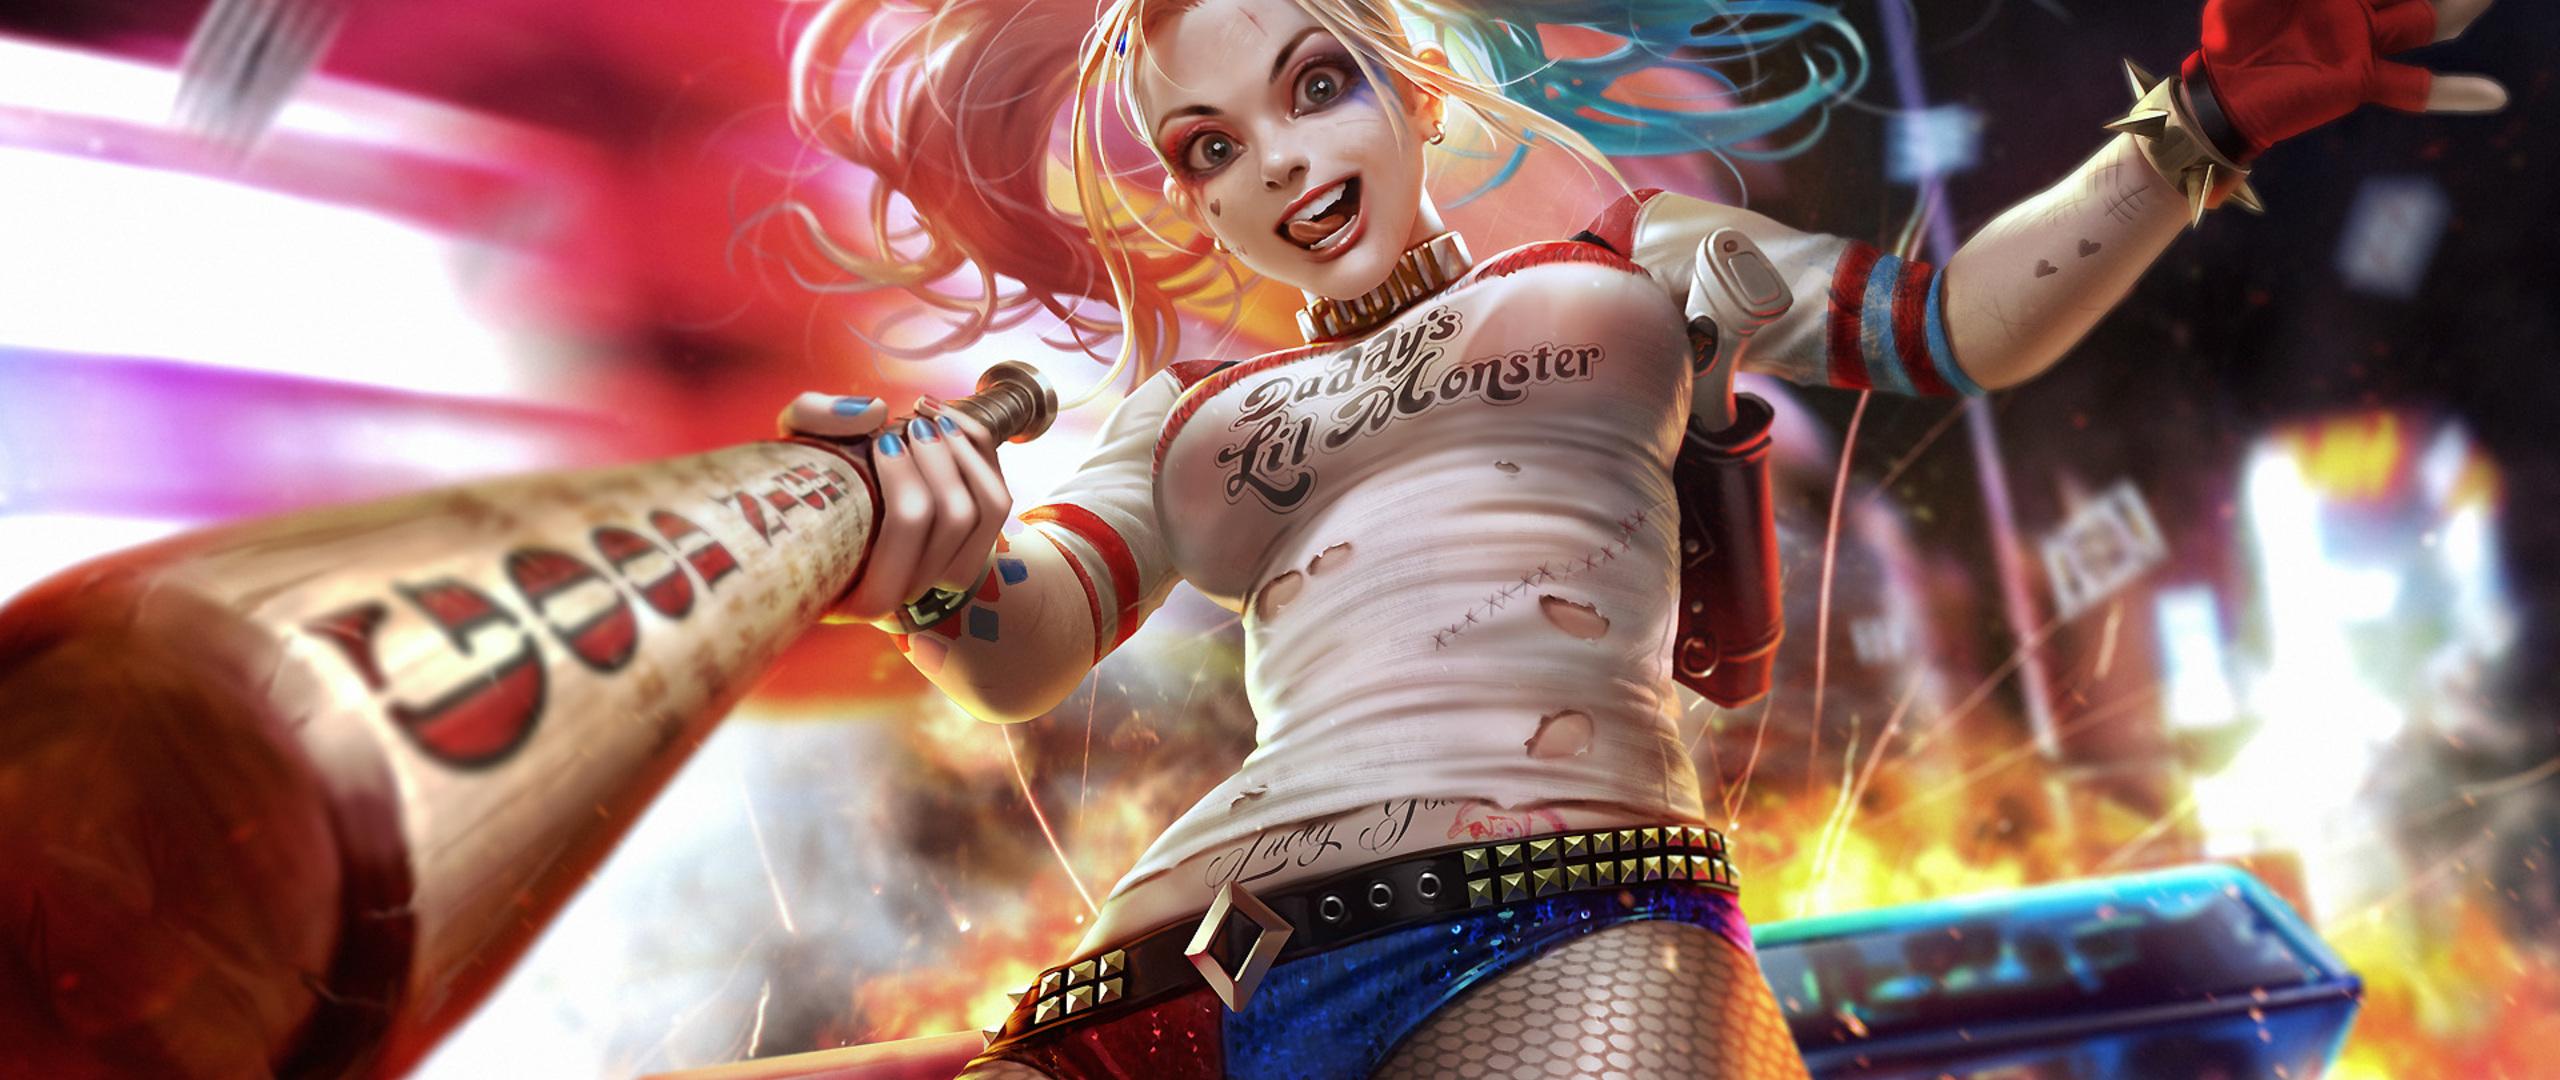 Harley Quinn 4k Hd Wallpapers: 2560x1080 Harley Quinn Amazing Art 2560x1080 Resolution HD